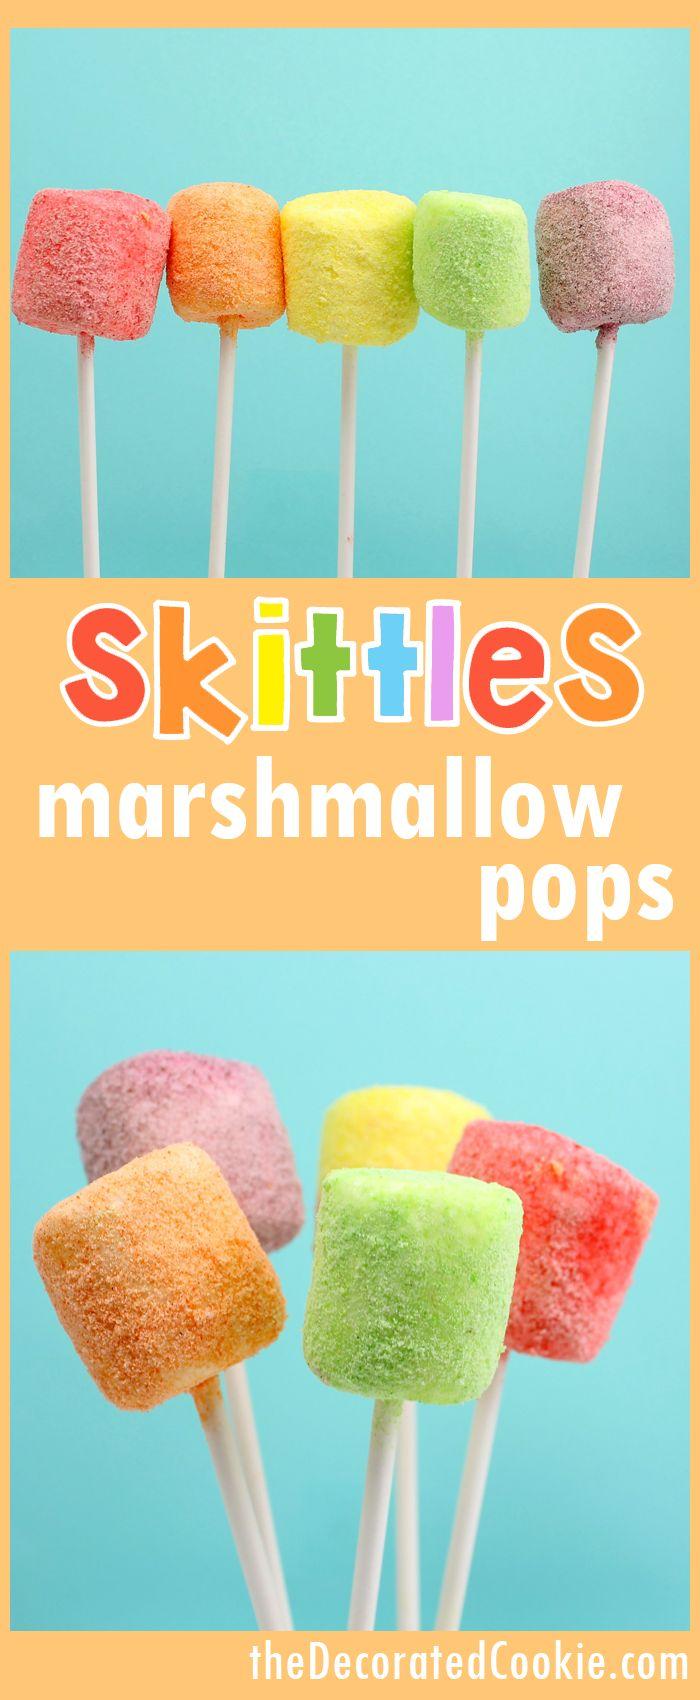 SKITTLES marshmallow pops! Rainbow party or unicorn food marshmallow pops using ground skittles candy.